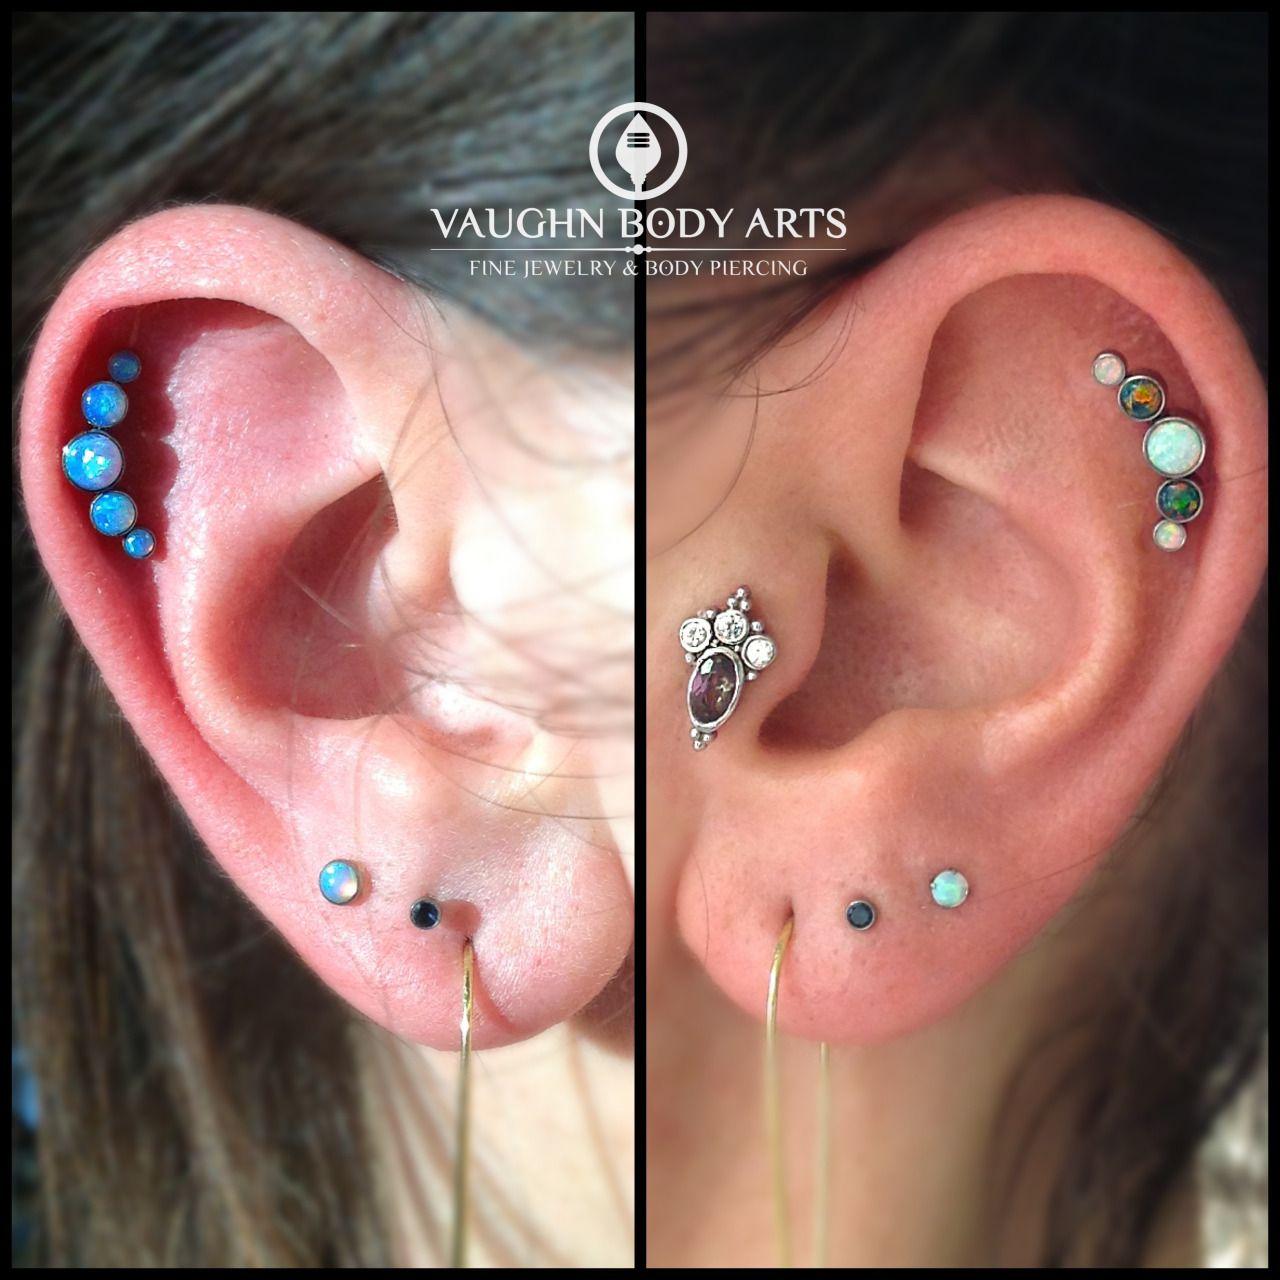 Piercing nose hole  VAUGHN BODY ARTS  Photo  Earrings  Pinterest  Beautiful Posts